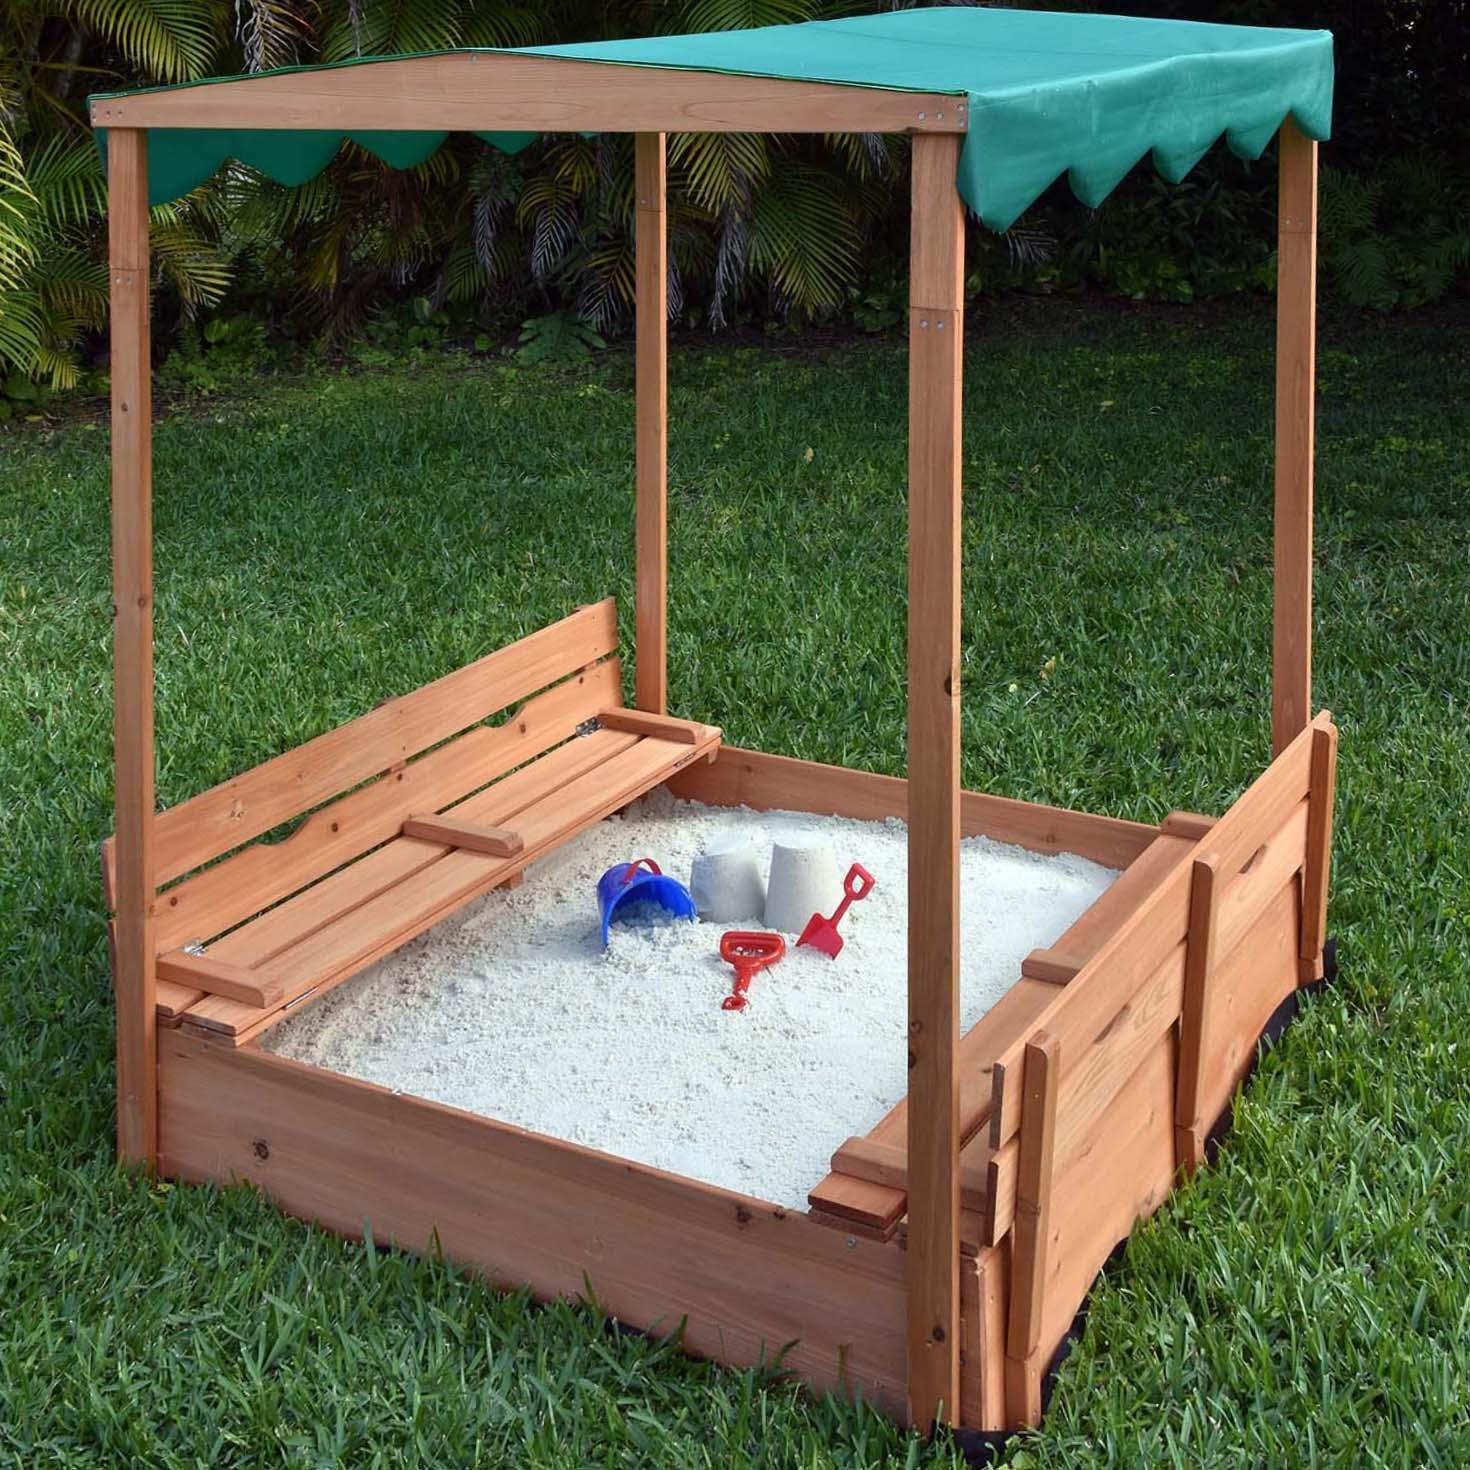 Naomi Home Kids Canopy Cedar Sandbox with Benches by Naomi Home (Image #3)